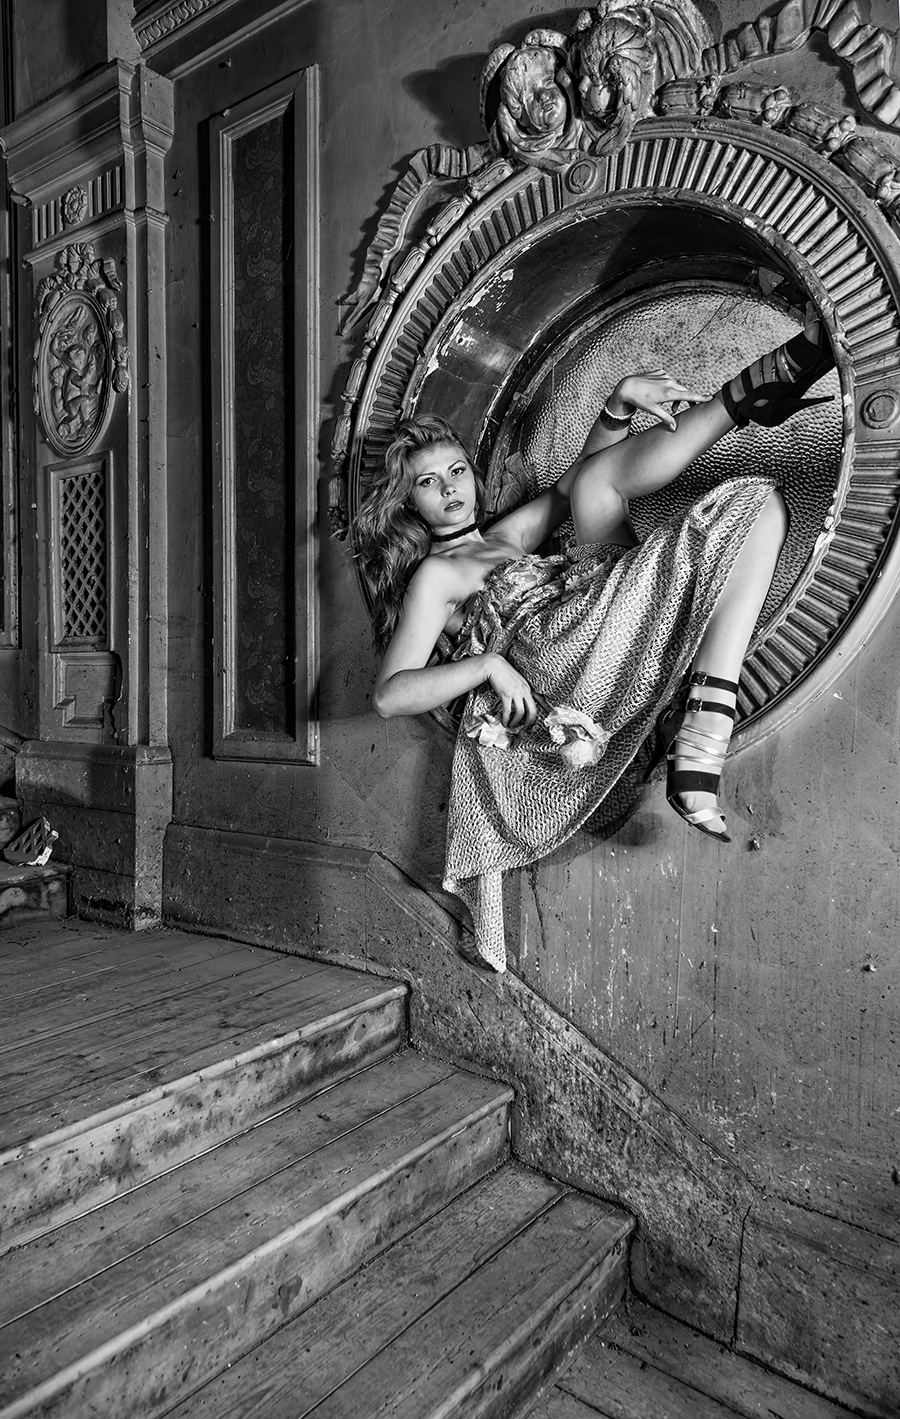 Photography by GaryMac Photography, Model Scarlett Fox / Uploaded 19th October 2015 @ 09:10 PM